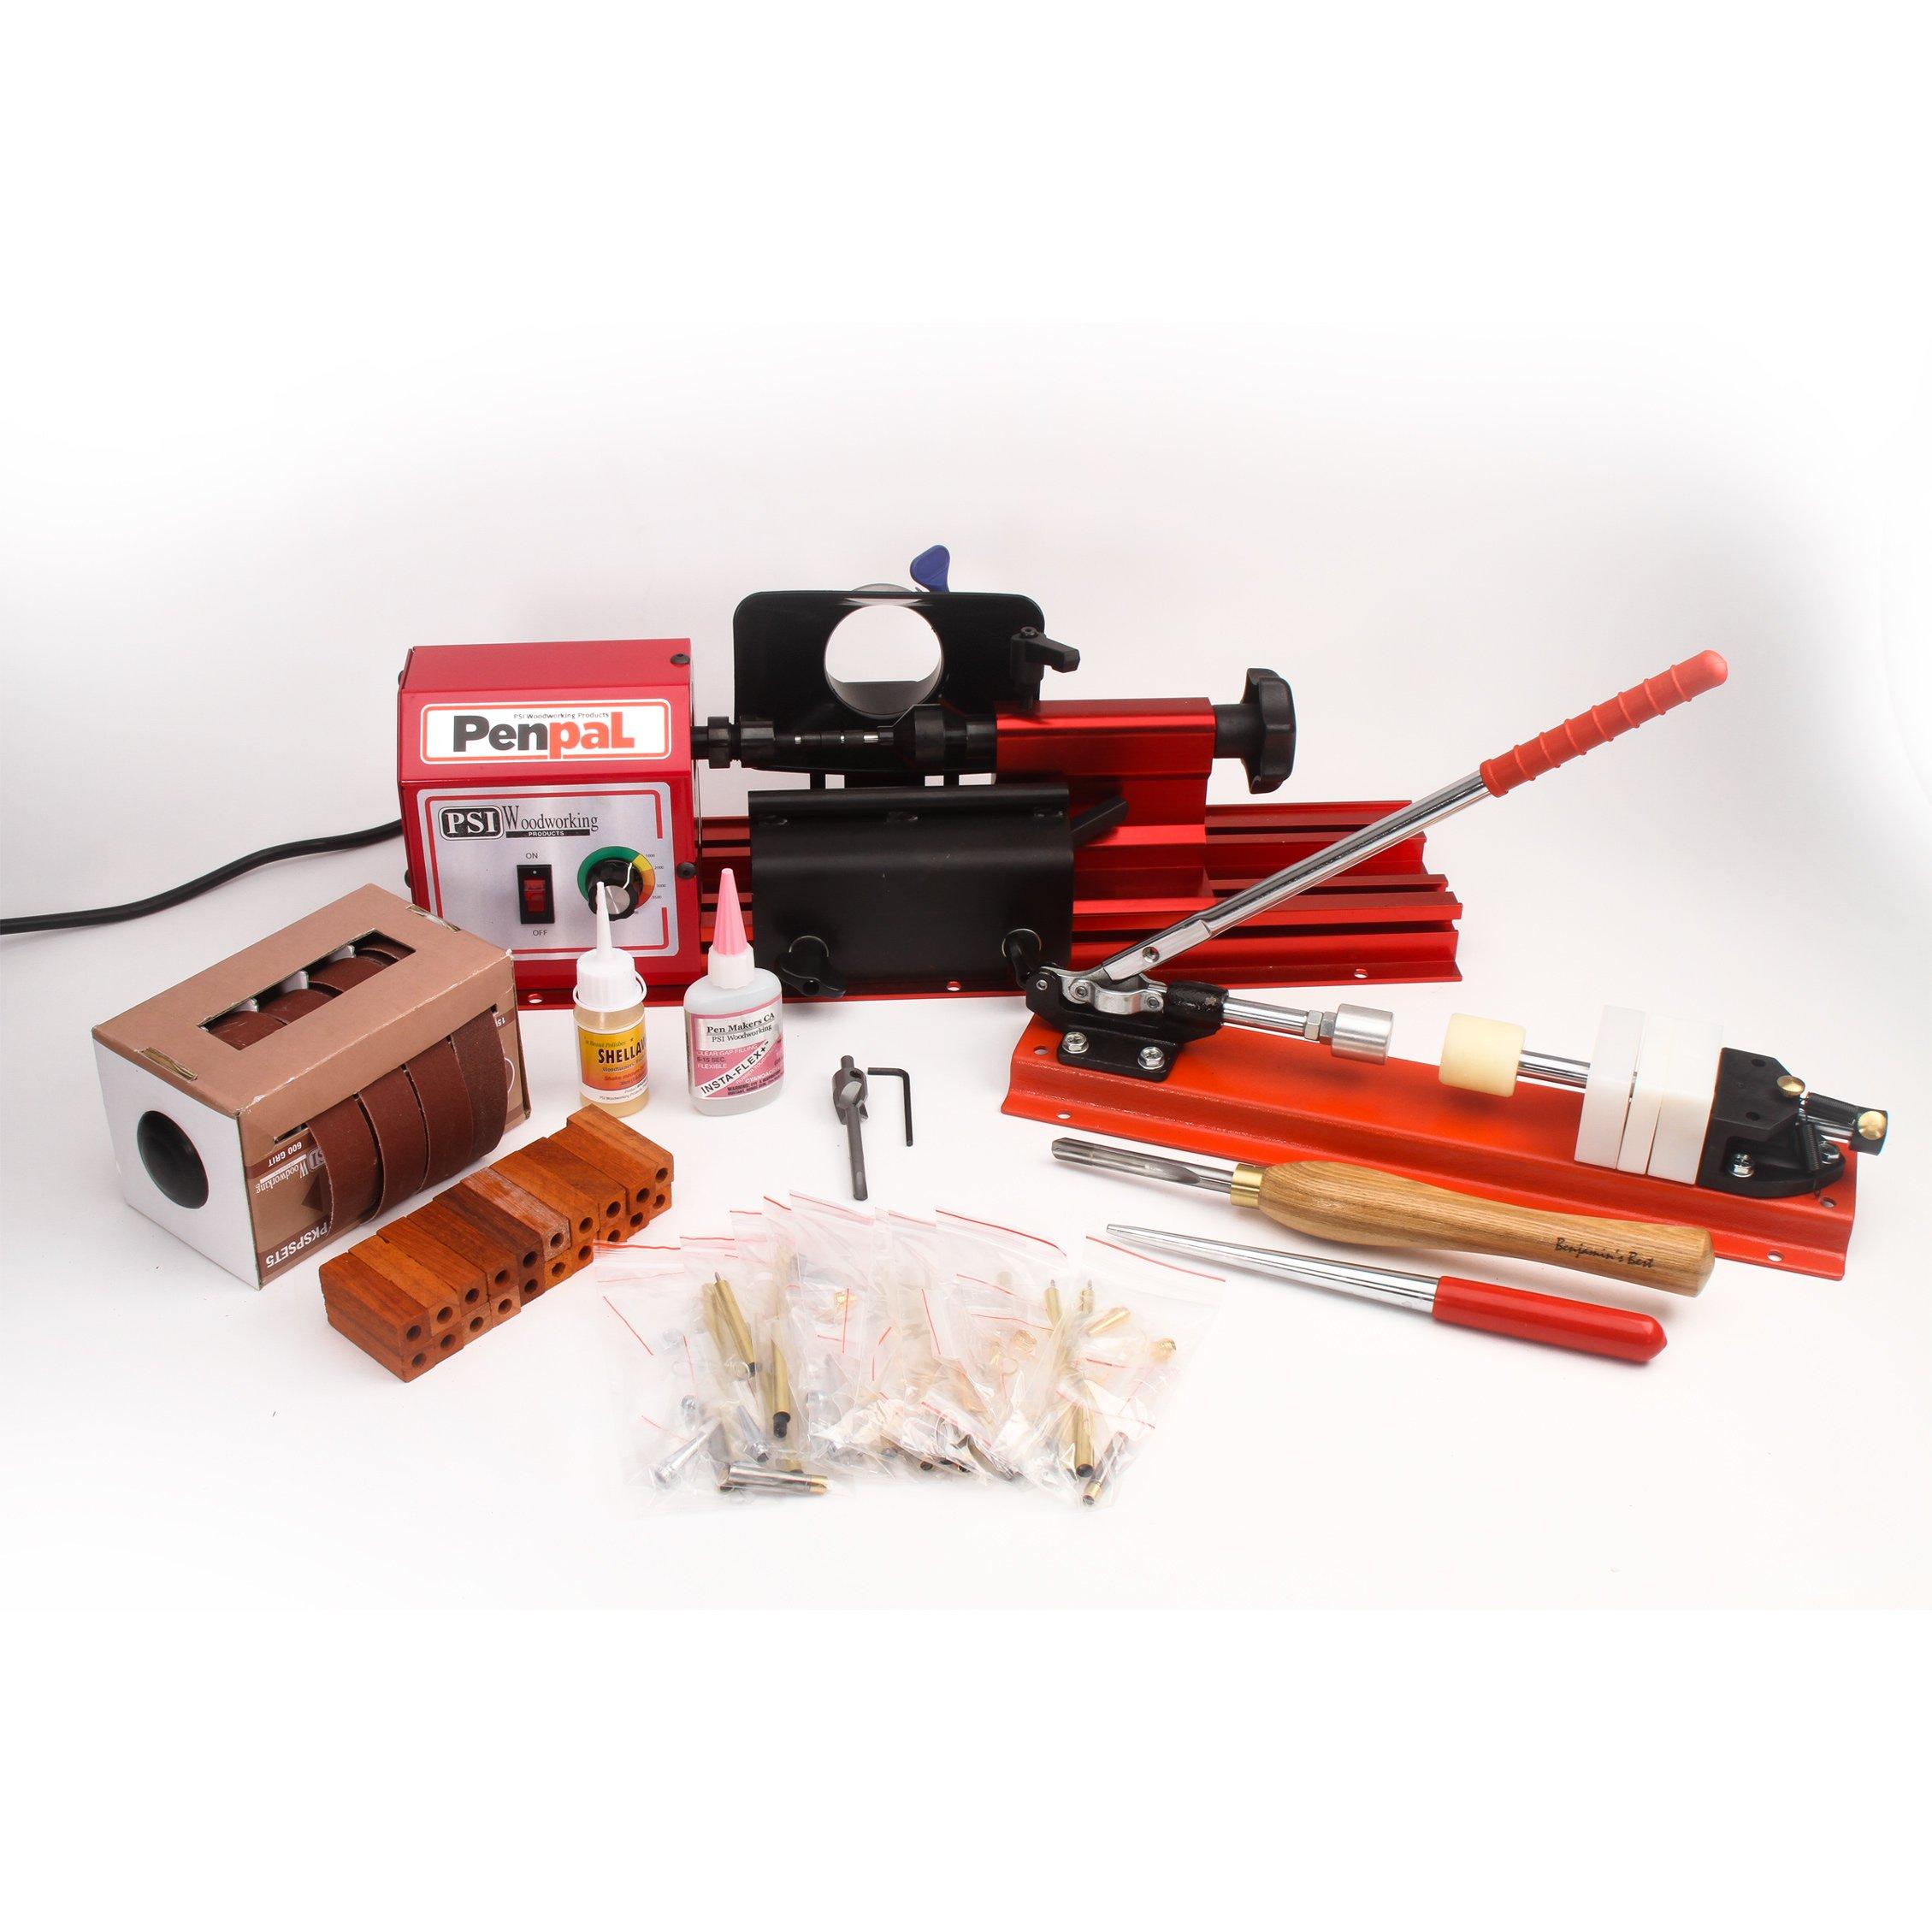 Kits Starter Wholesale Pen Turning